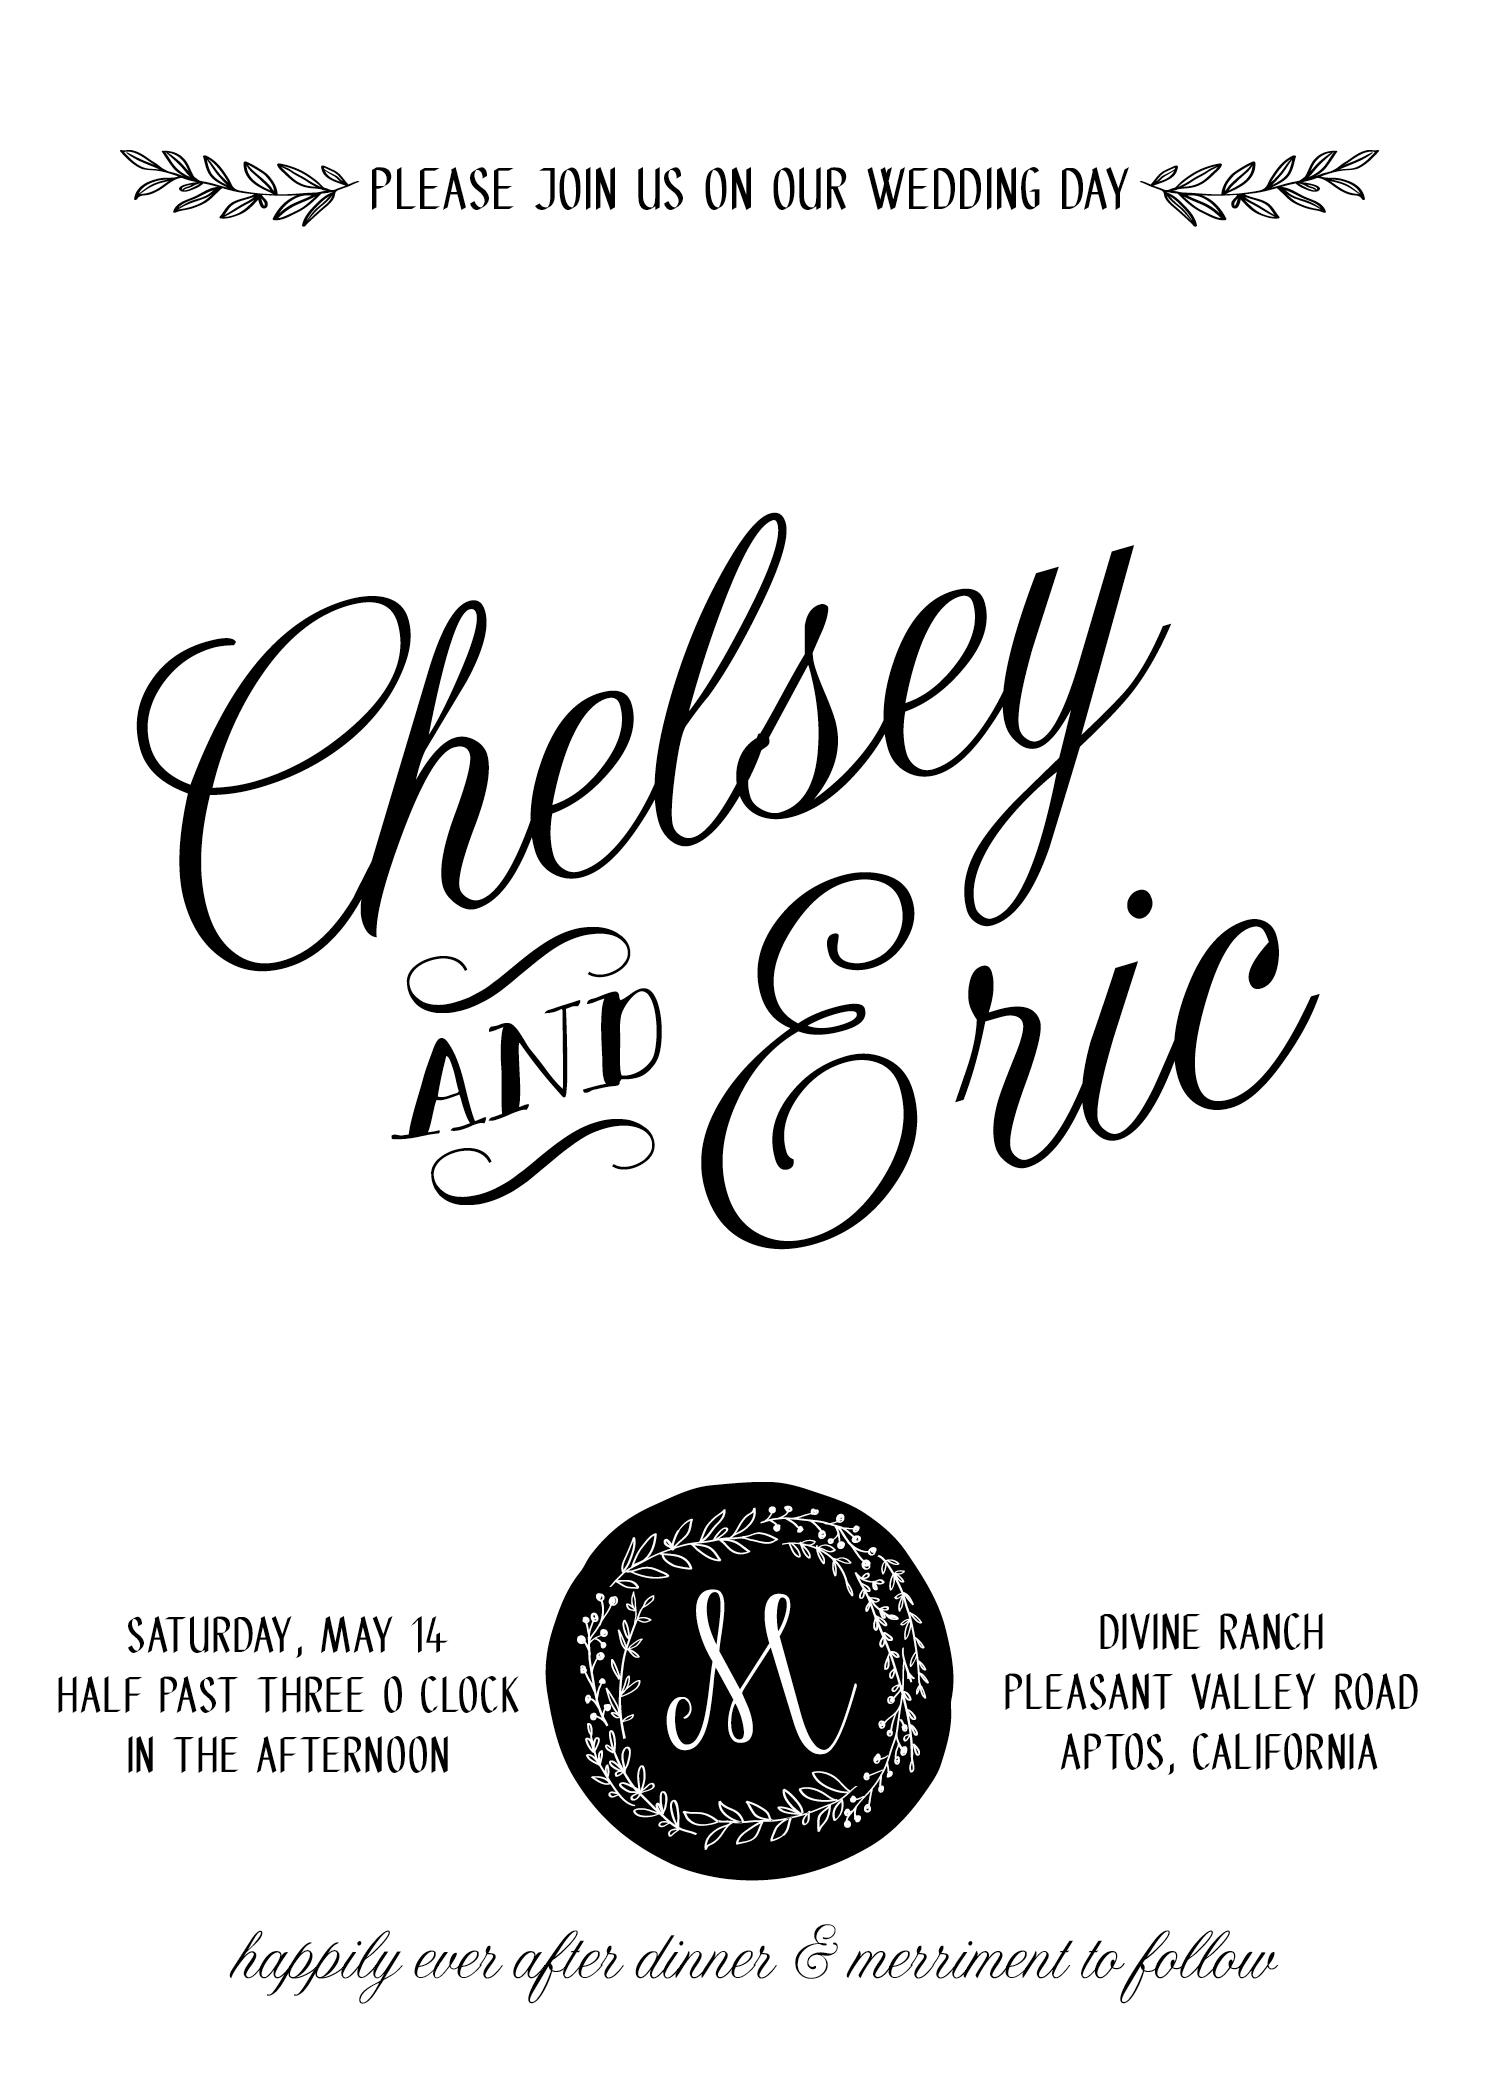 WEDDING  INVITATION + EVENT PLANNING